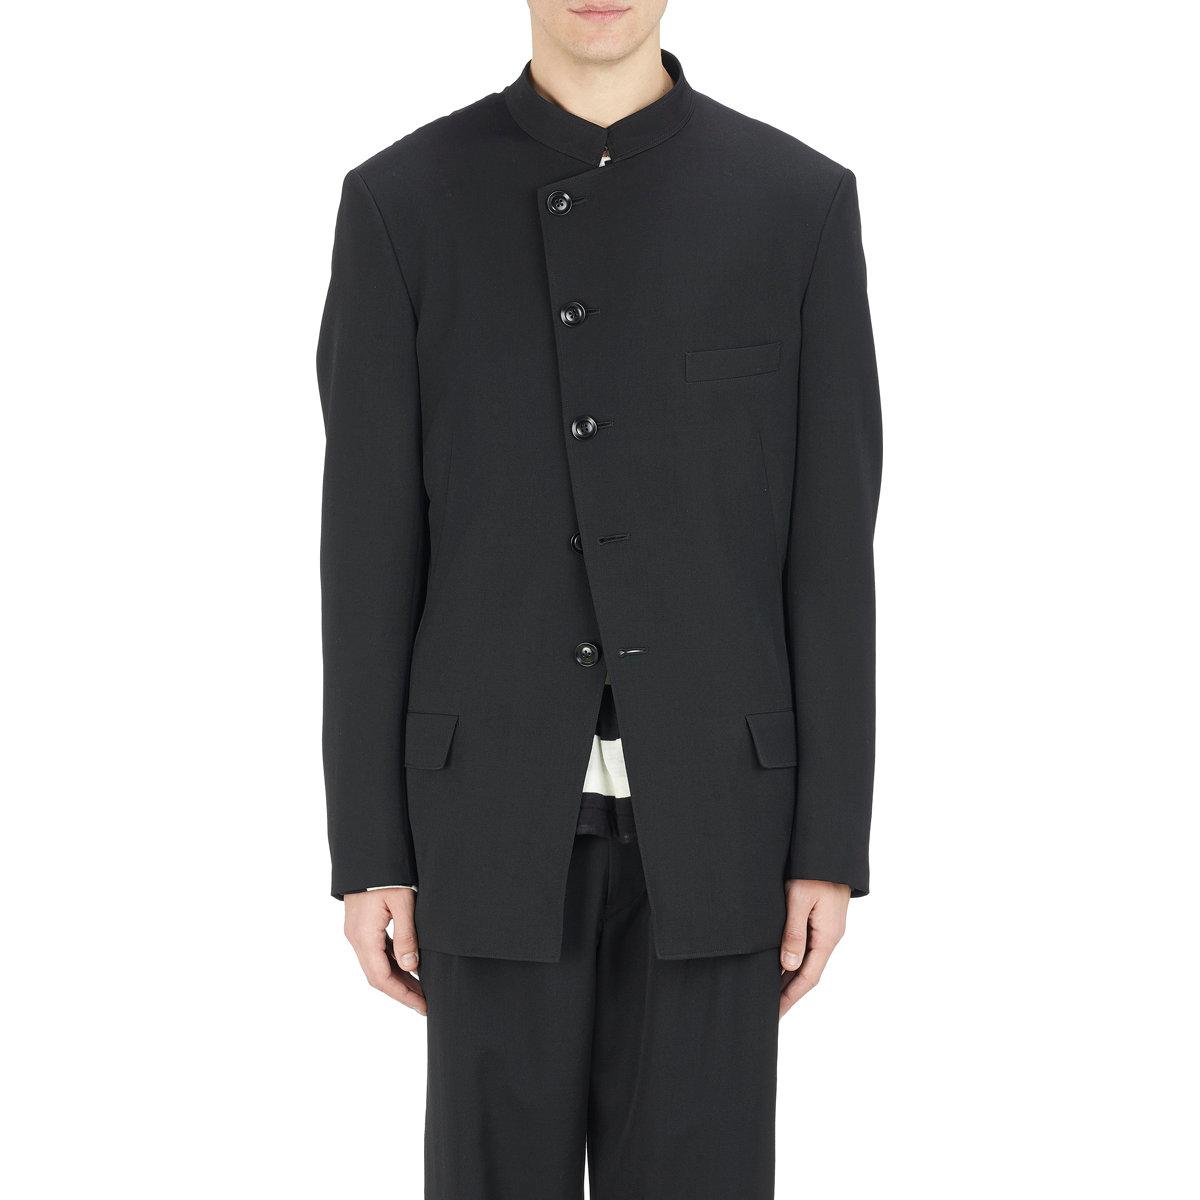 Yohji Yamamoto asymmetric jacket Free Shipping Pre Order Visit New Sale Online Buy Cheap Pictures 8mqM02TER